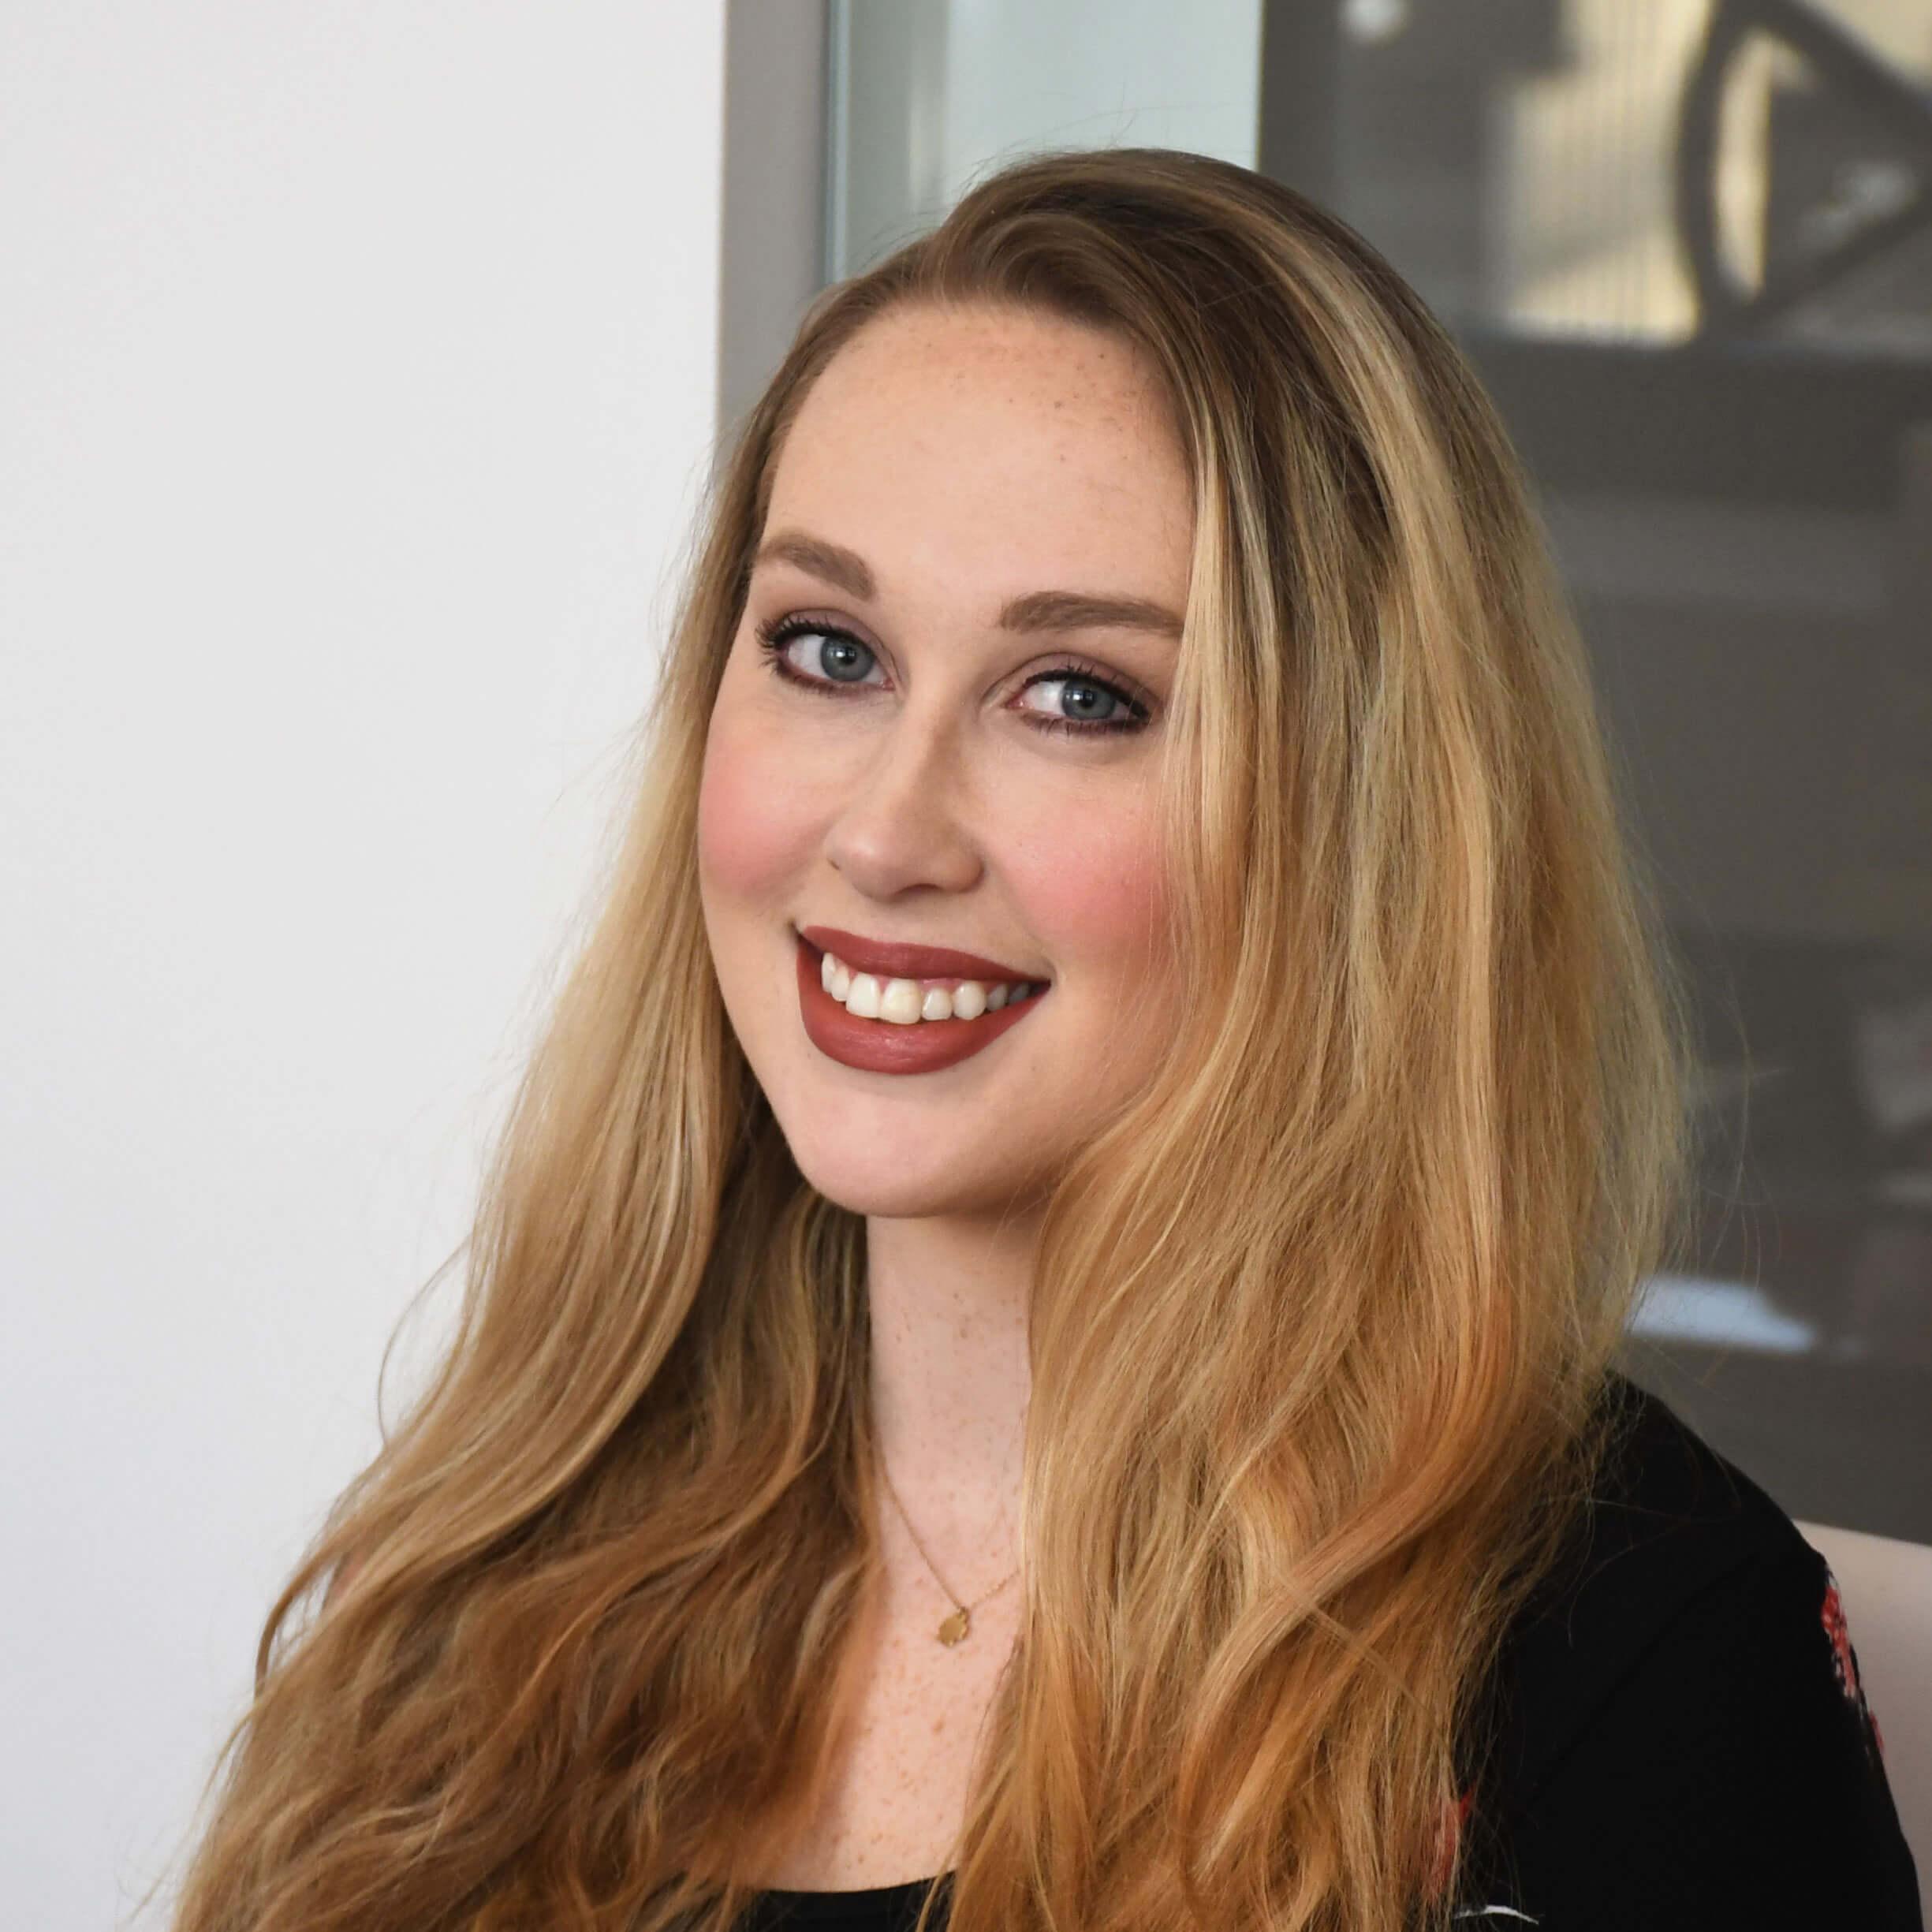 Danielle Wisneski | Account Manager